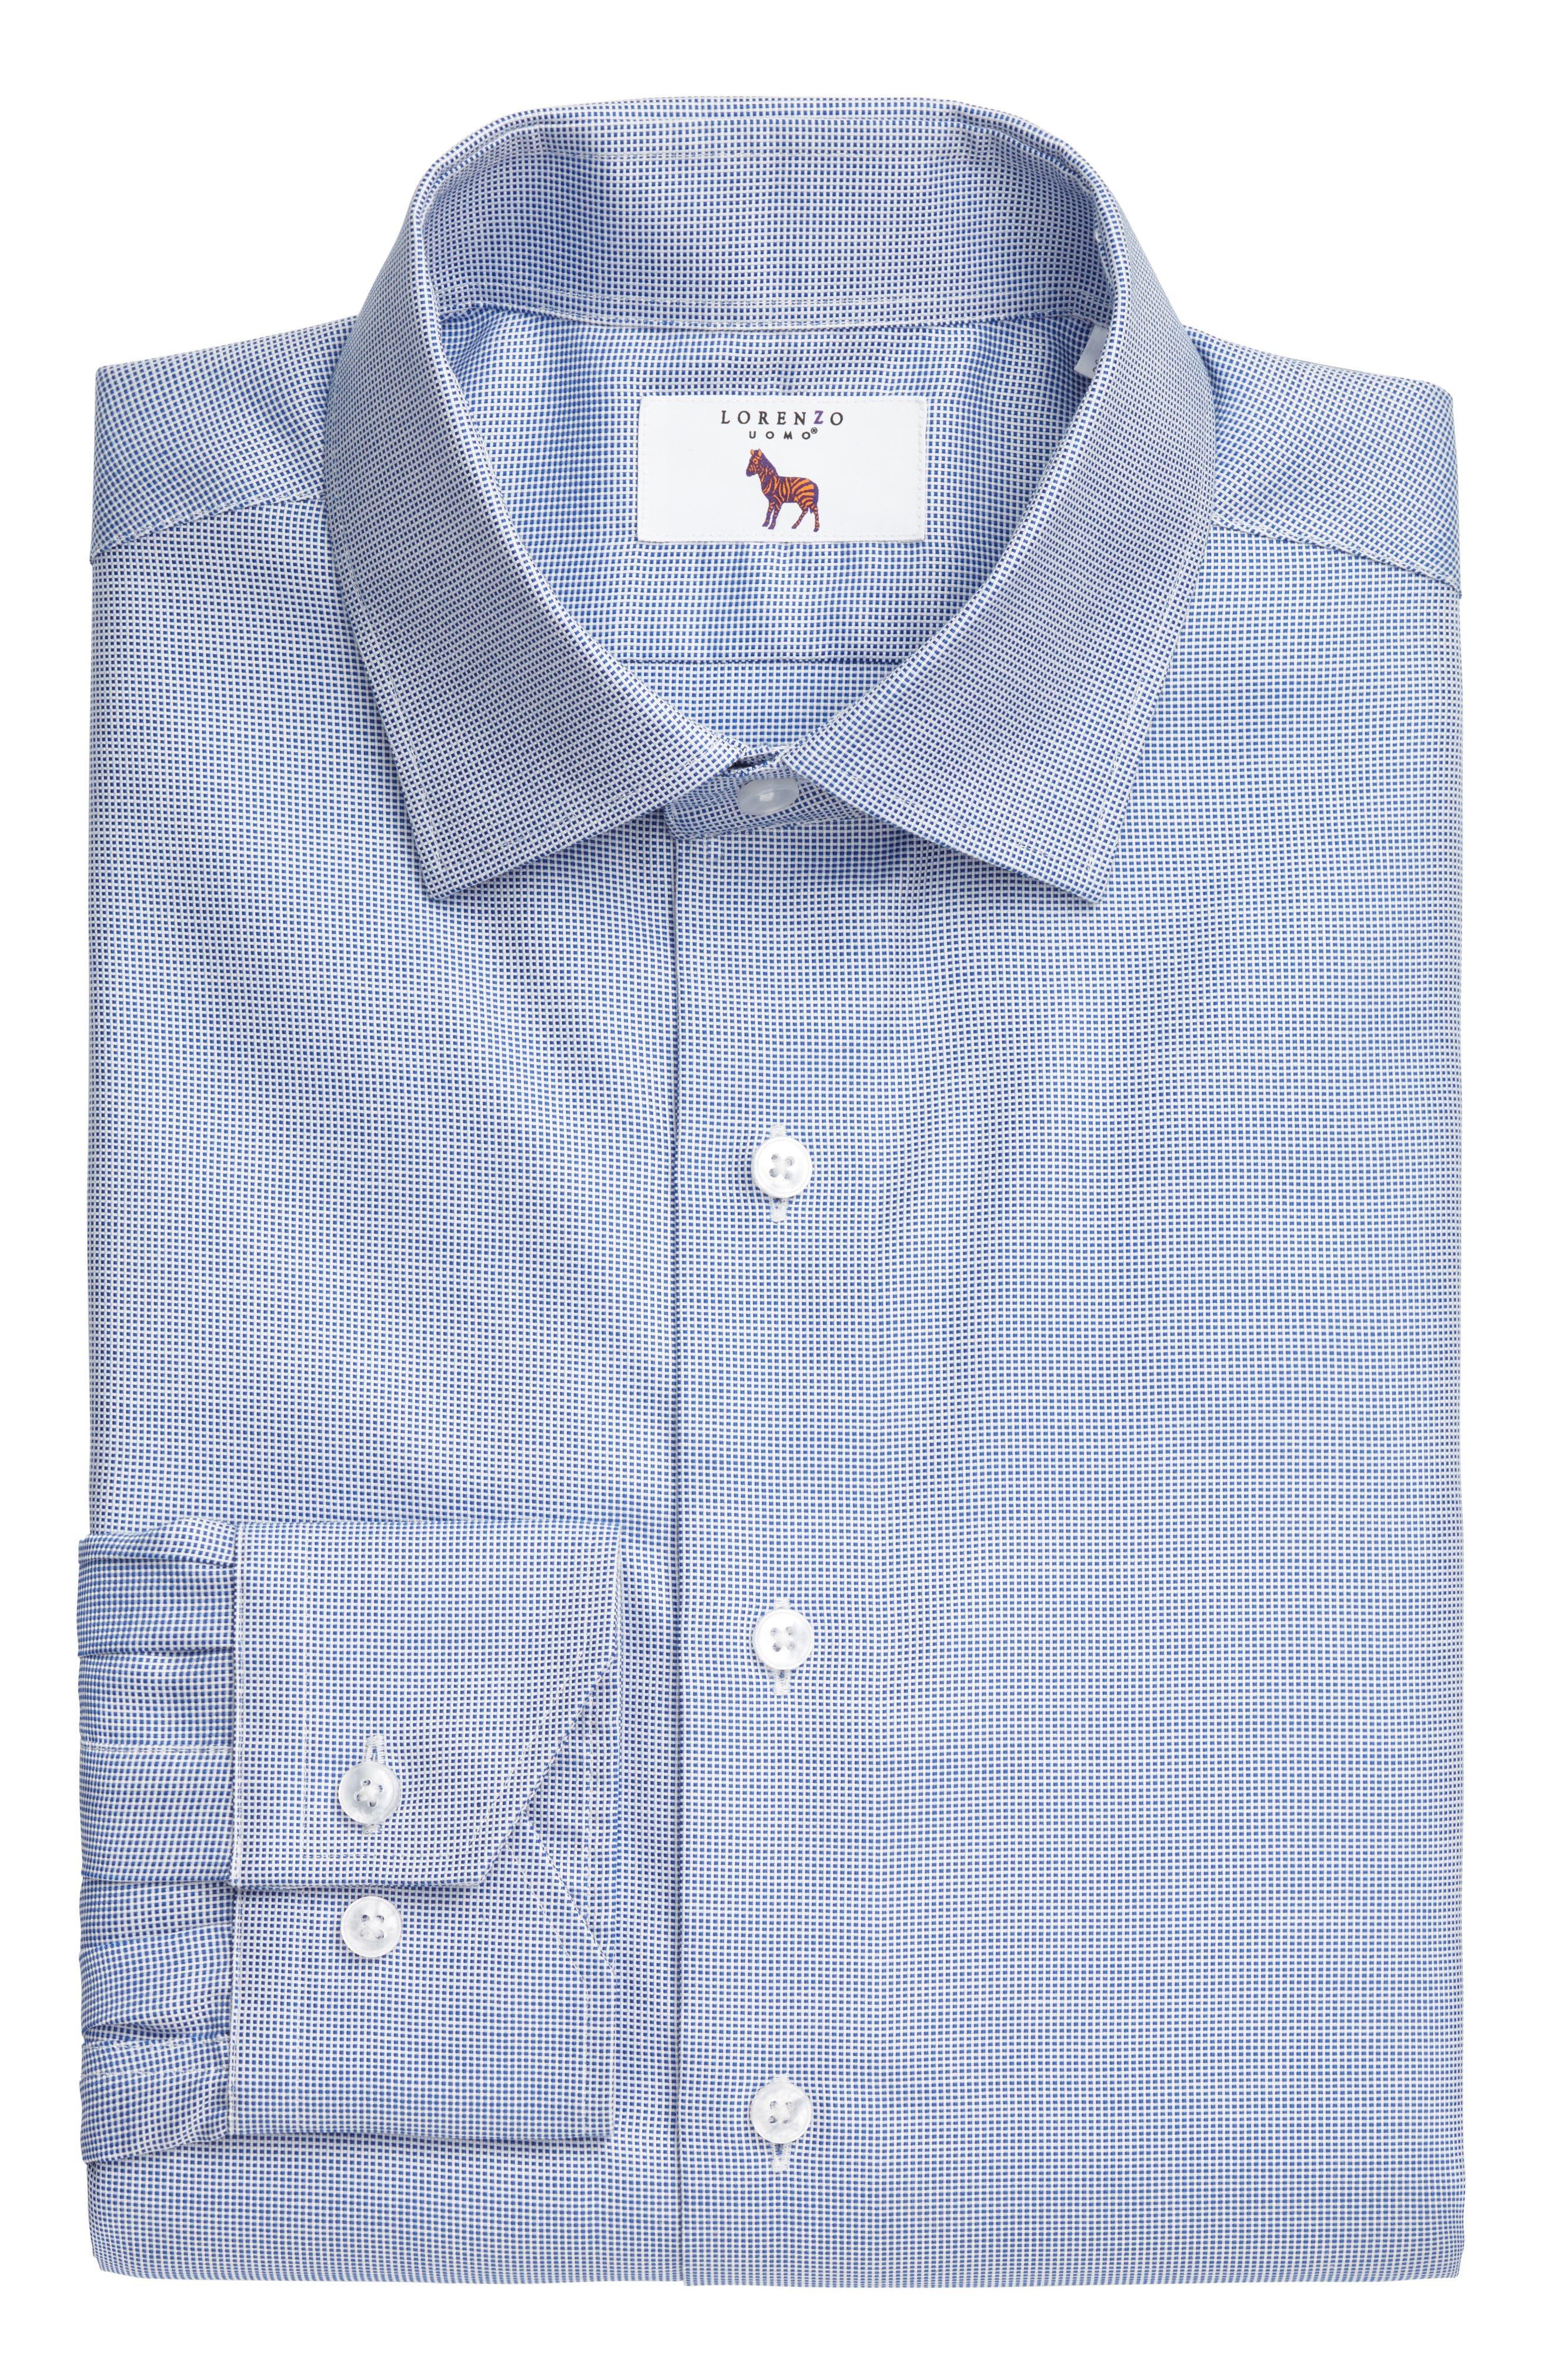 Main Image - Lorenzo Uomo Trim Fit Textured Dress Shirt